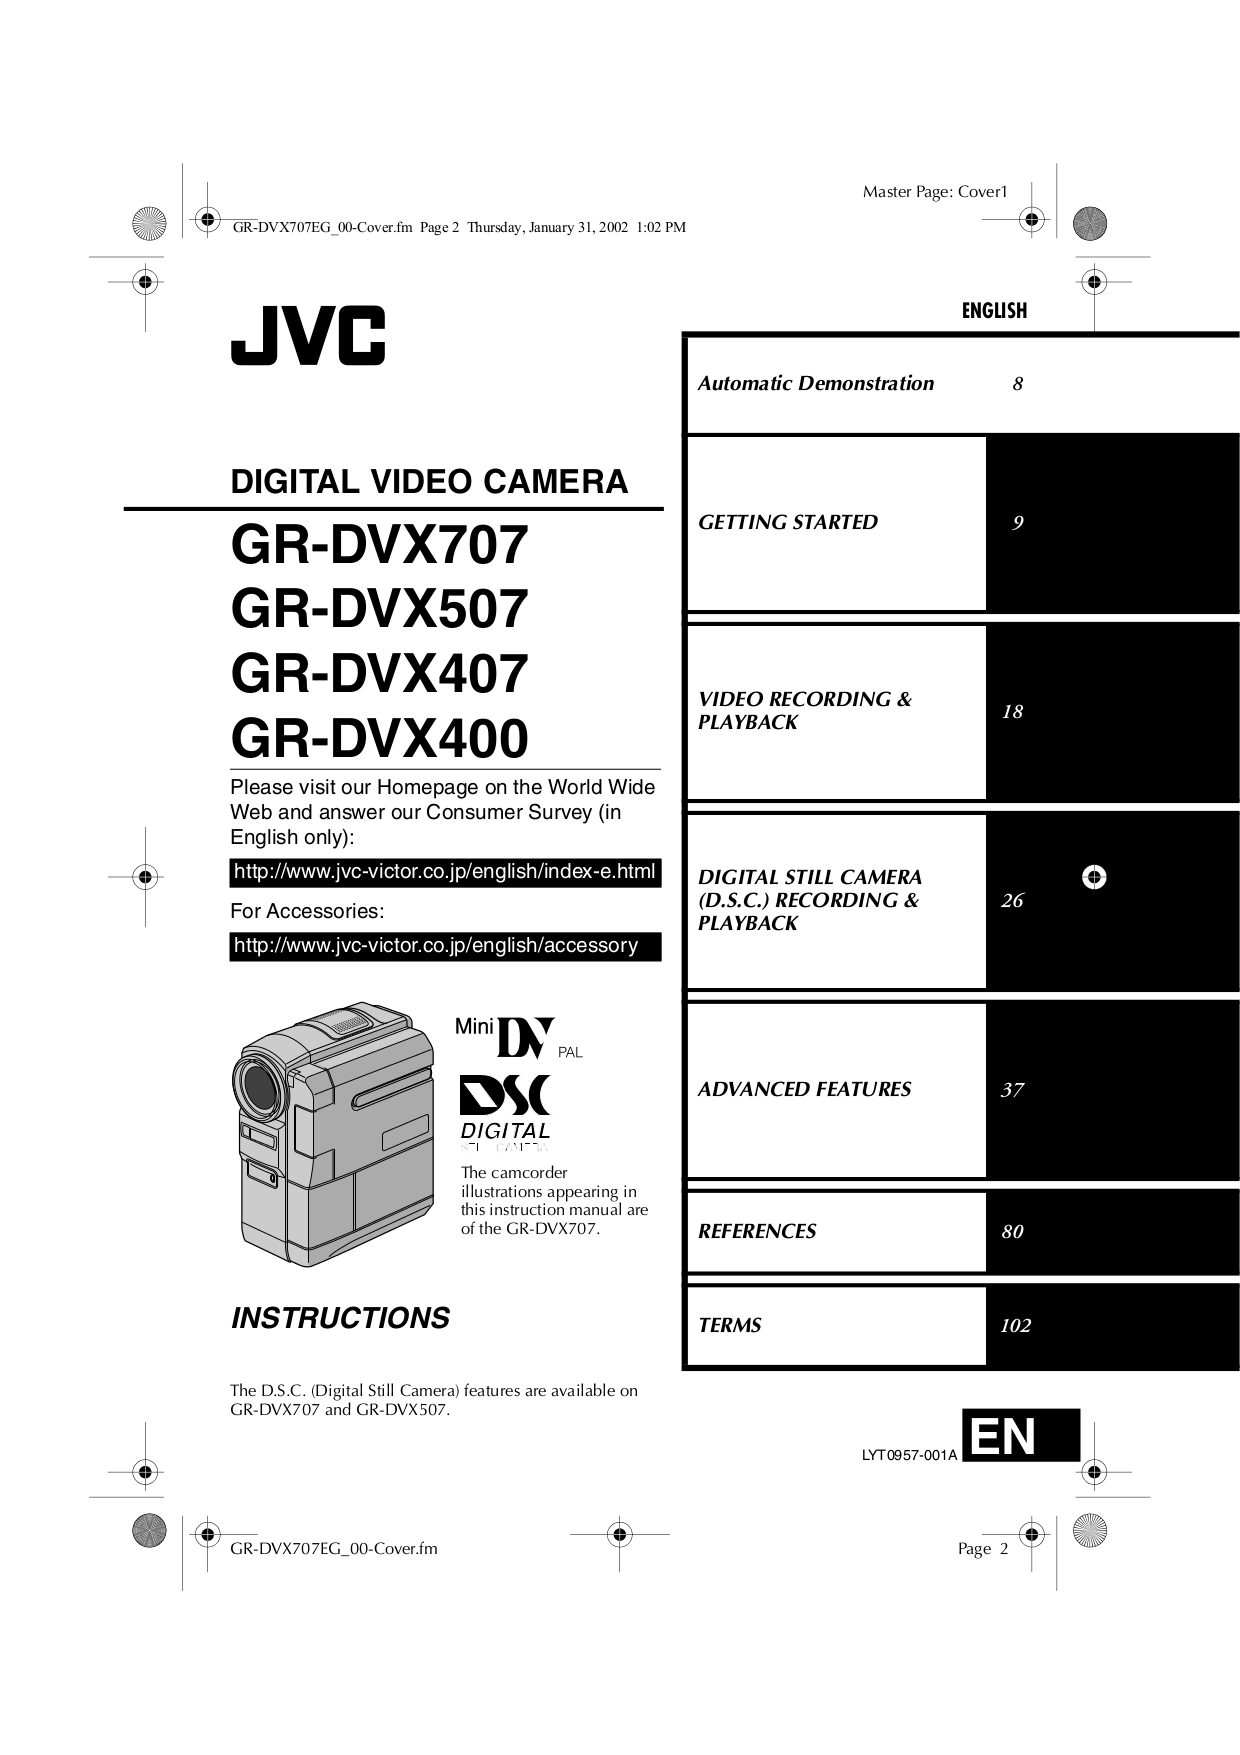 Jvc pro manuals pdf for jvc camcorders gr dvx400eg x manual fandeluxe Choice Image